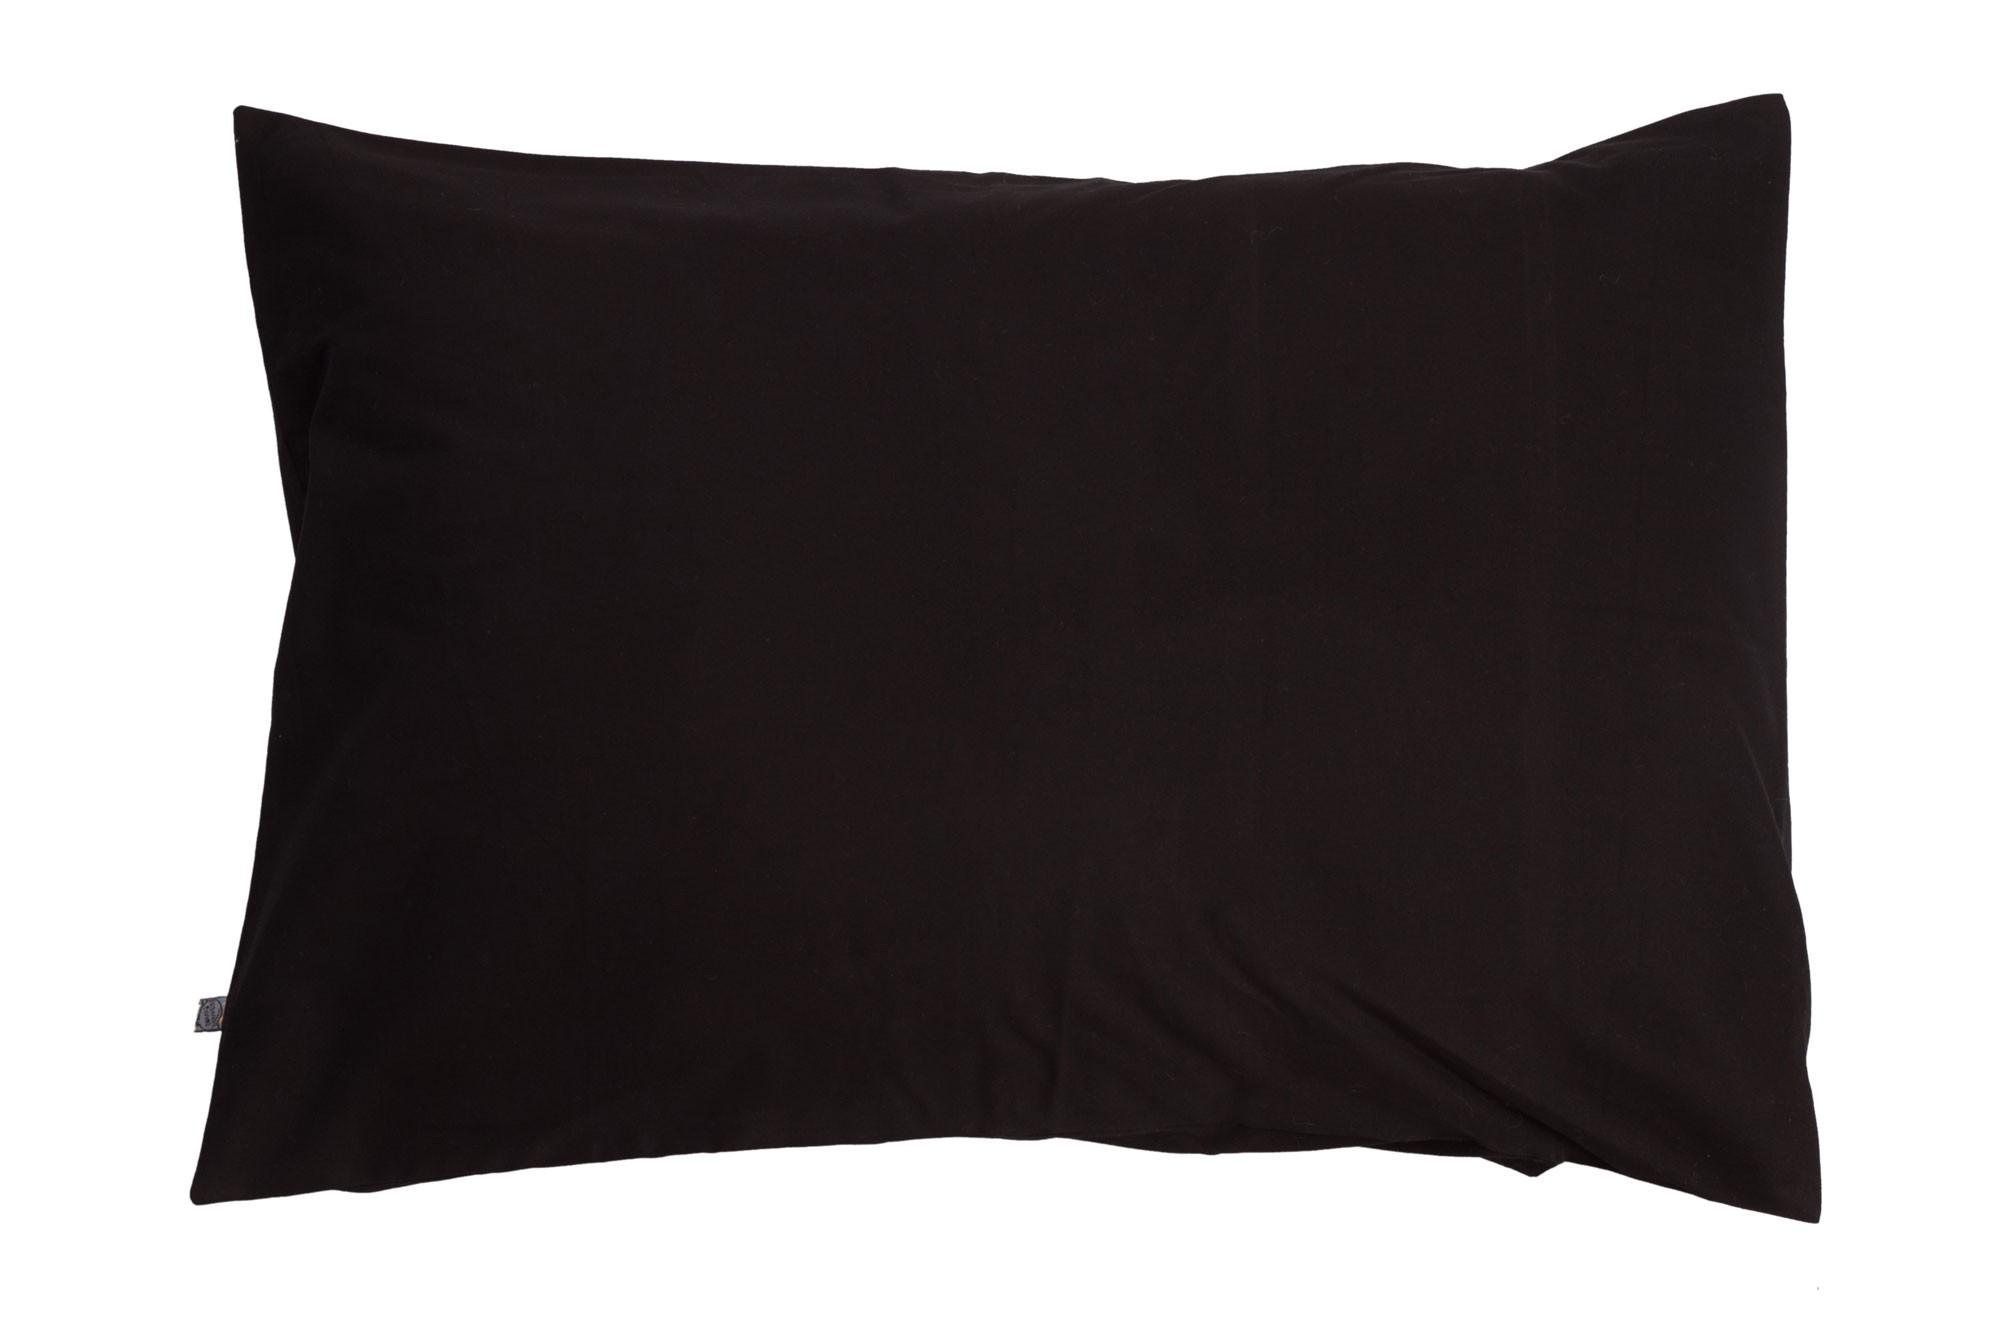 Porta travesseiro liso preto